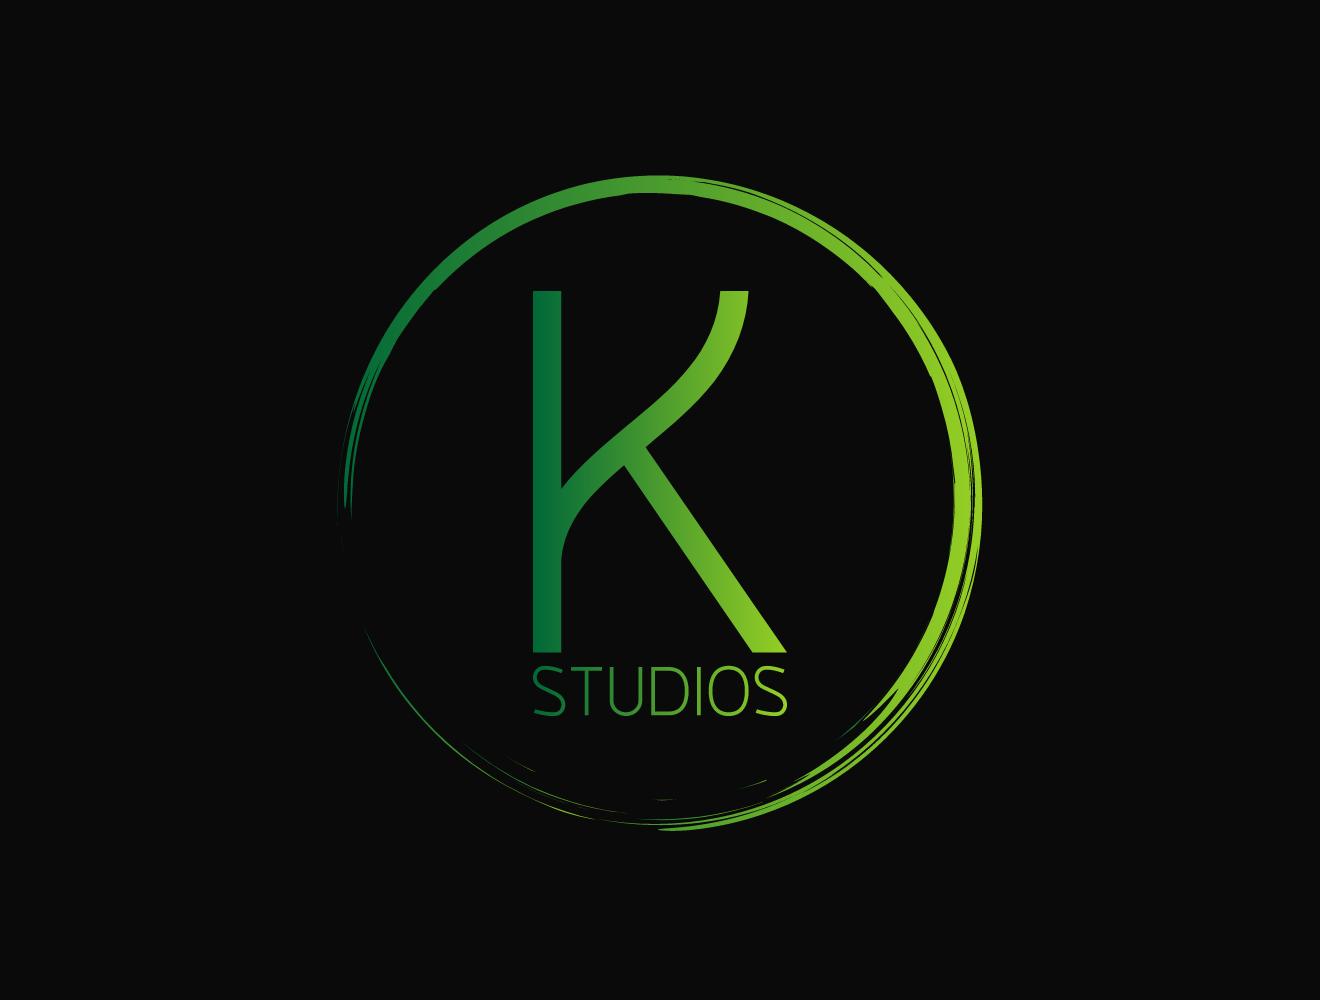 K STUDIOS image